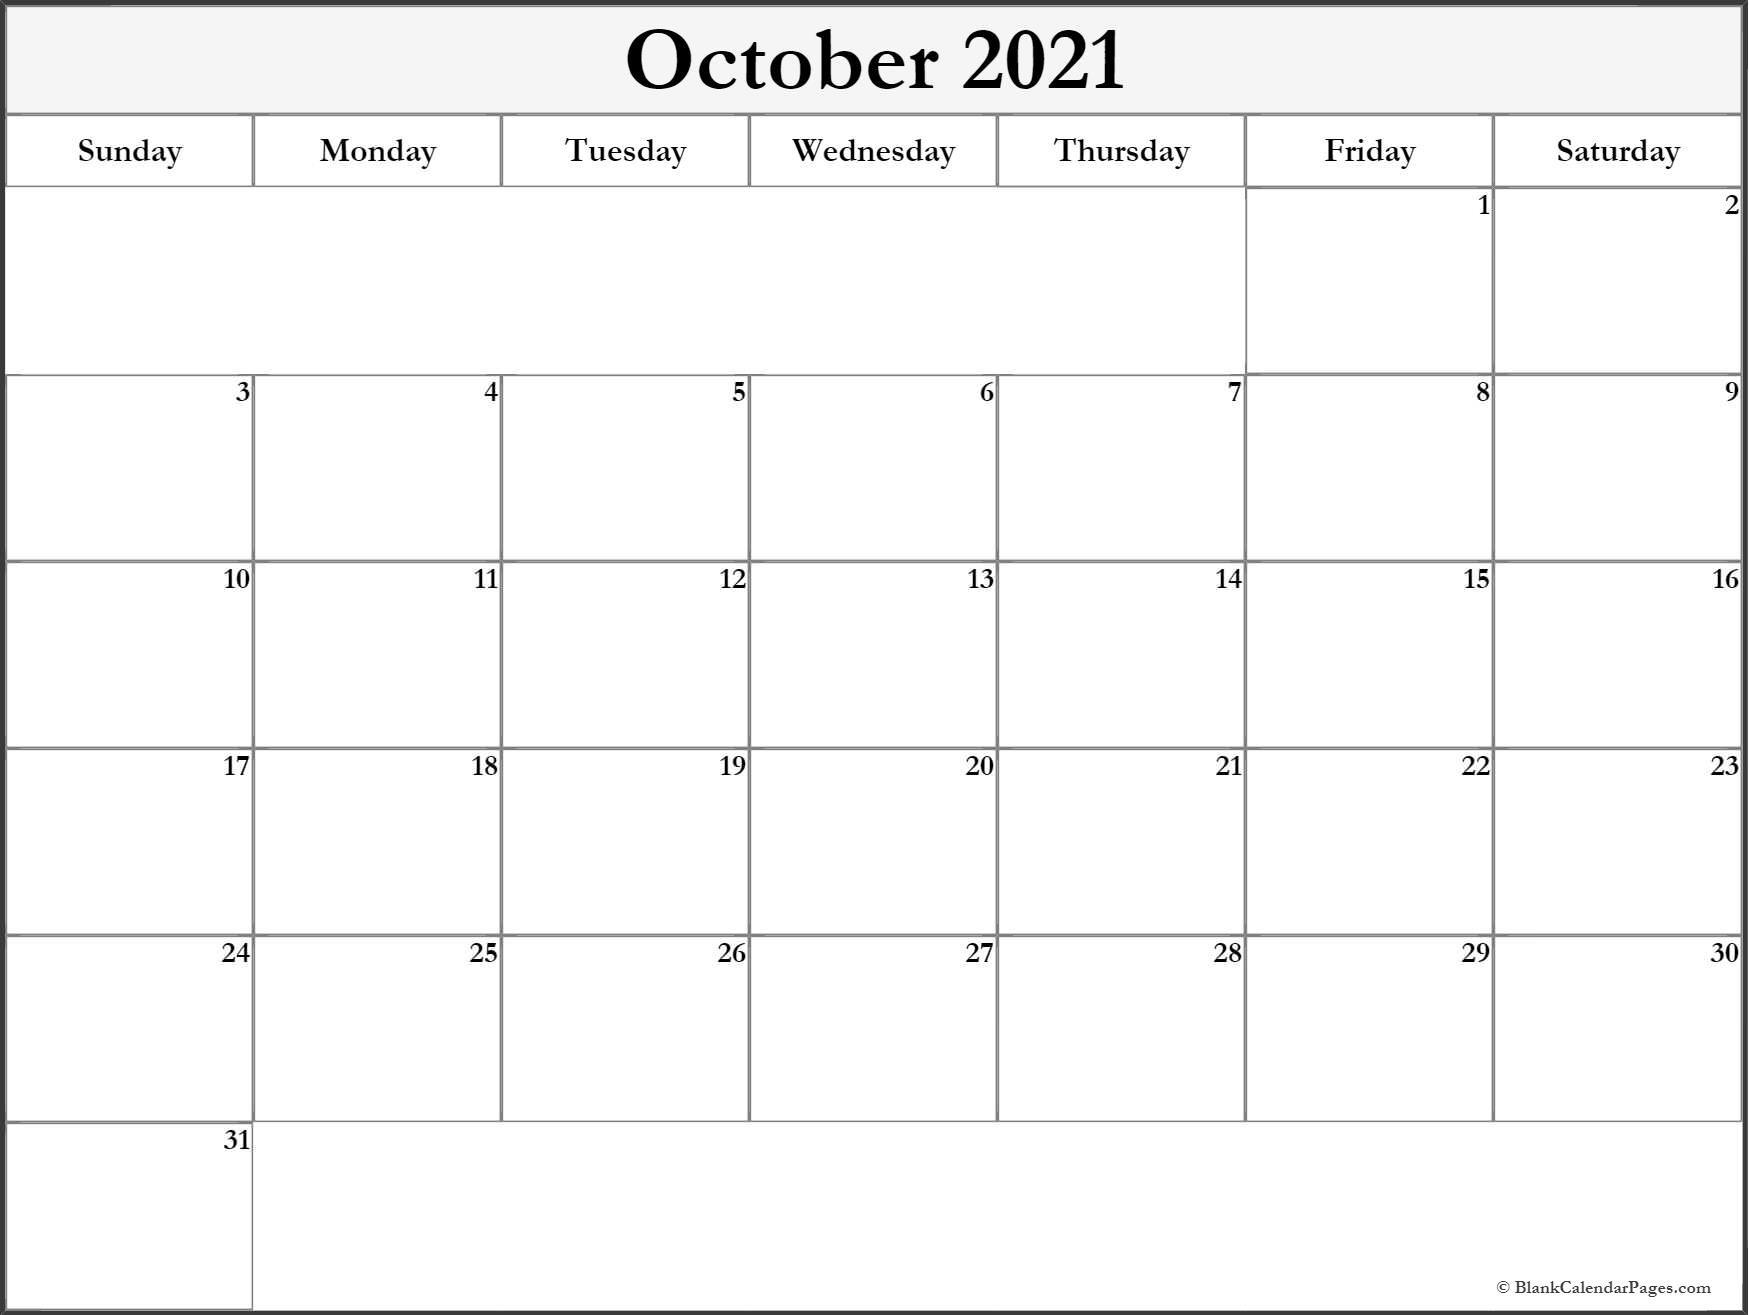 October 2021 Blank Calendar Templates.-Monthly Schedule Planner August 2021